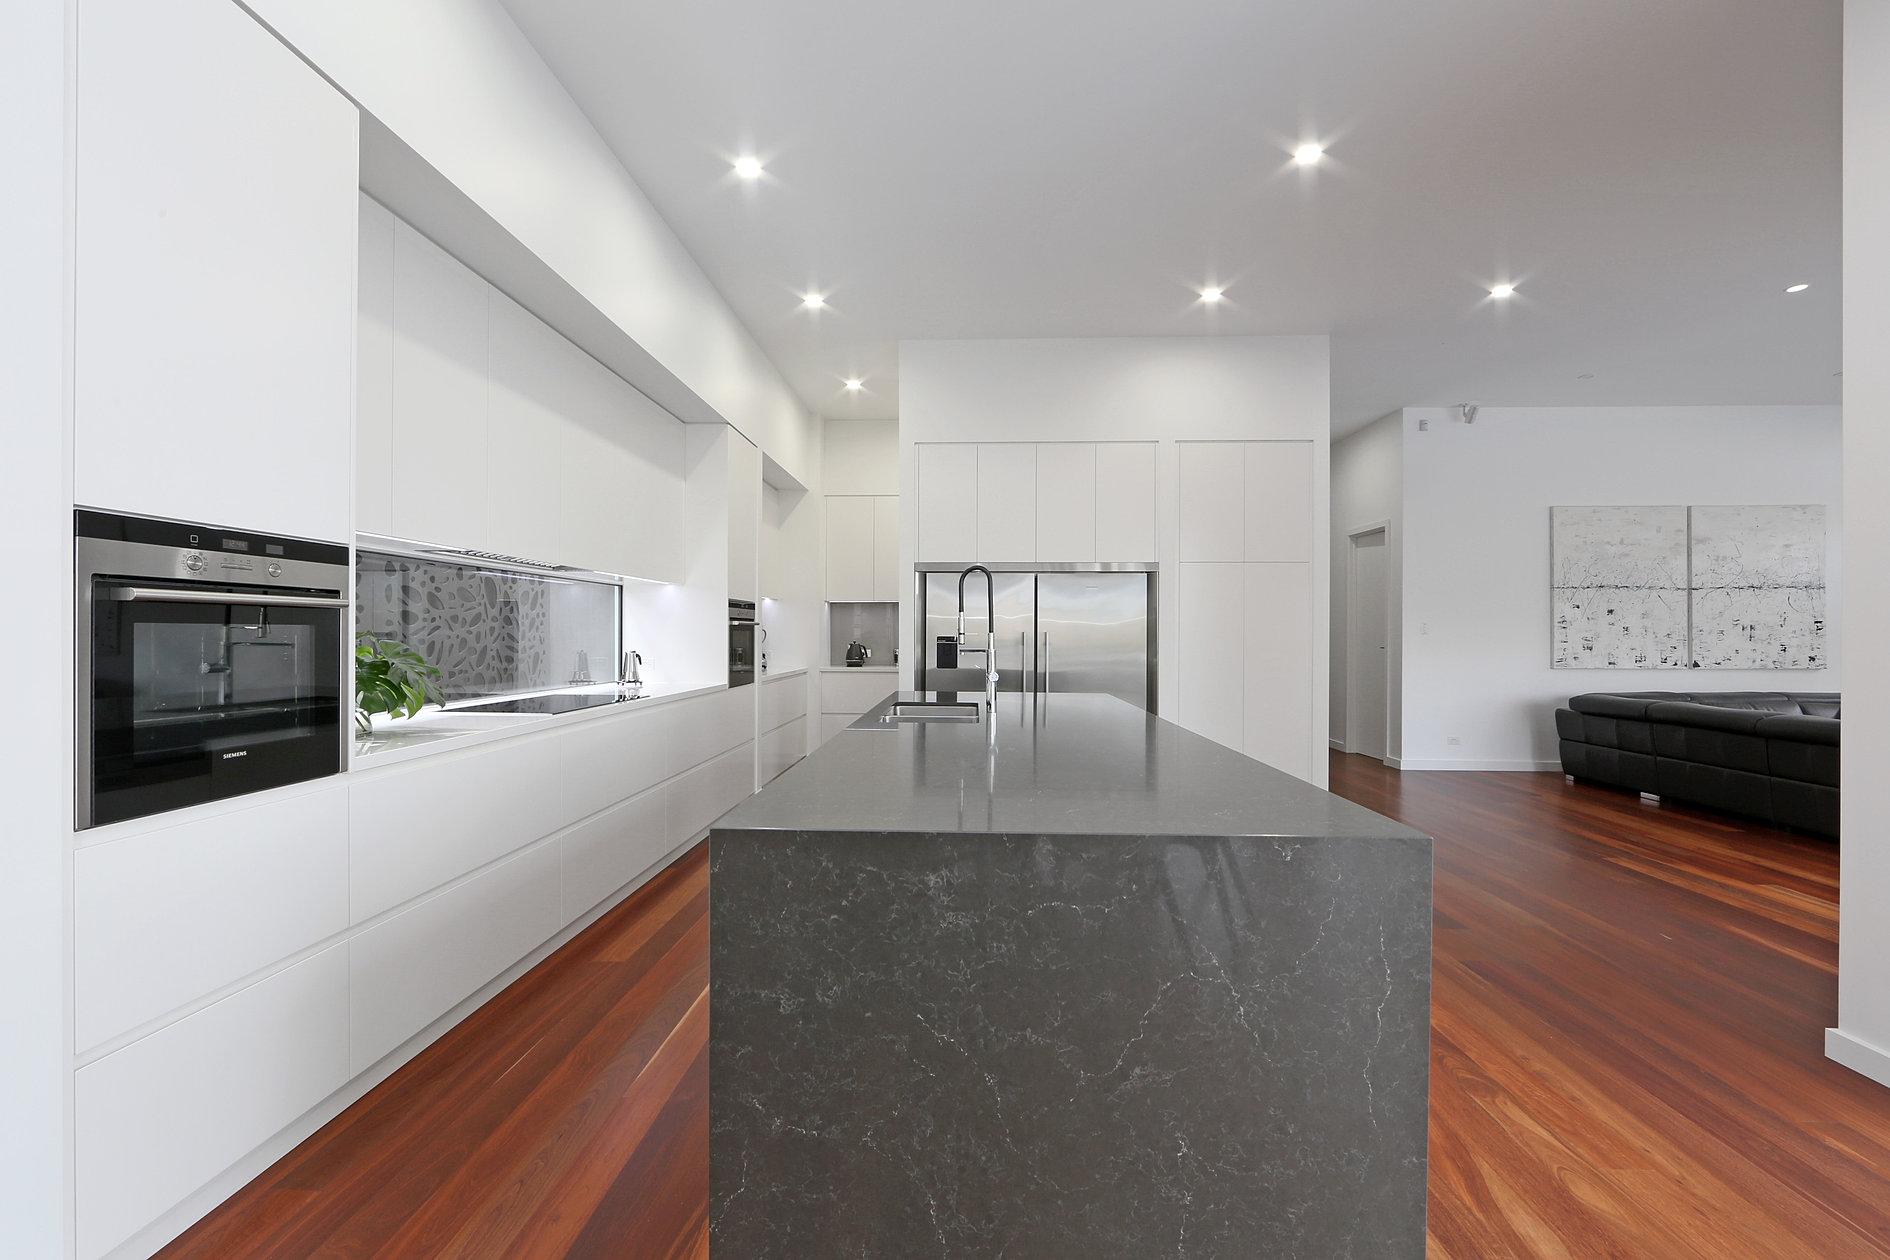 Commercial Kitchen Design Melbourne